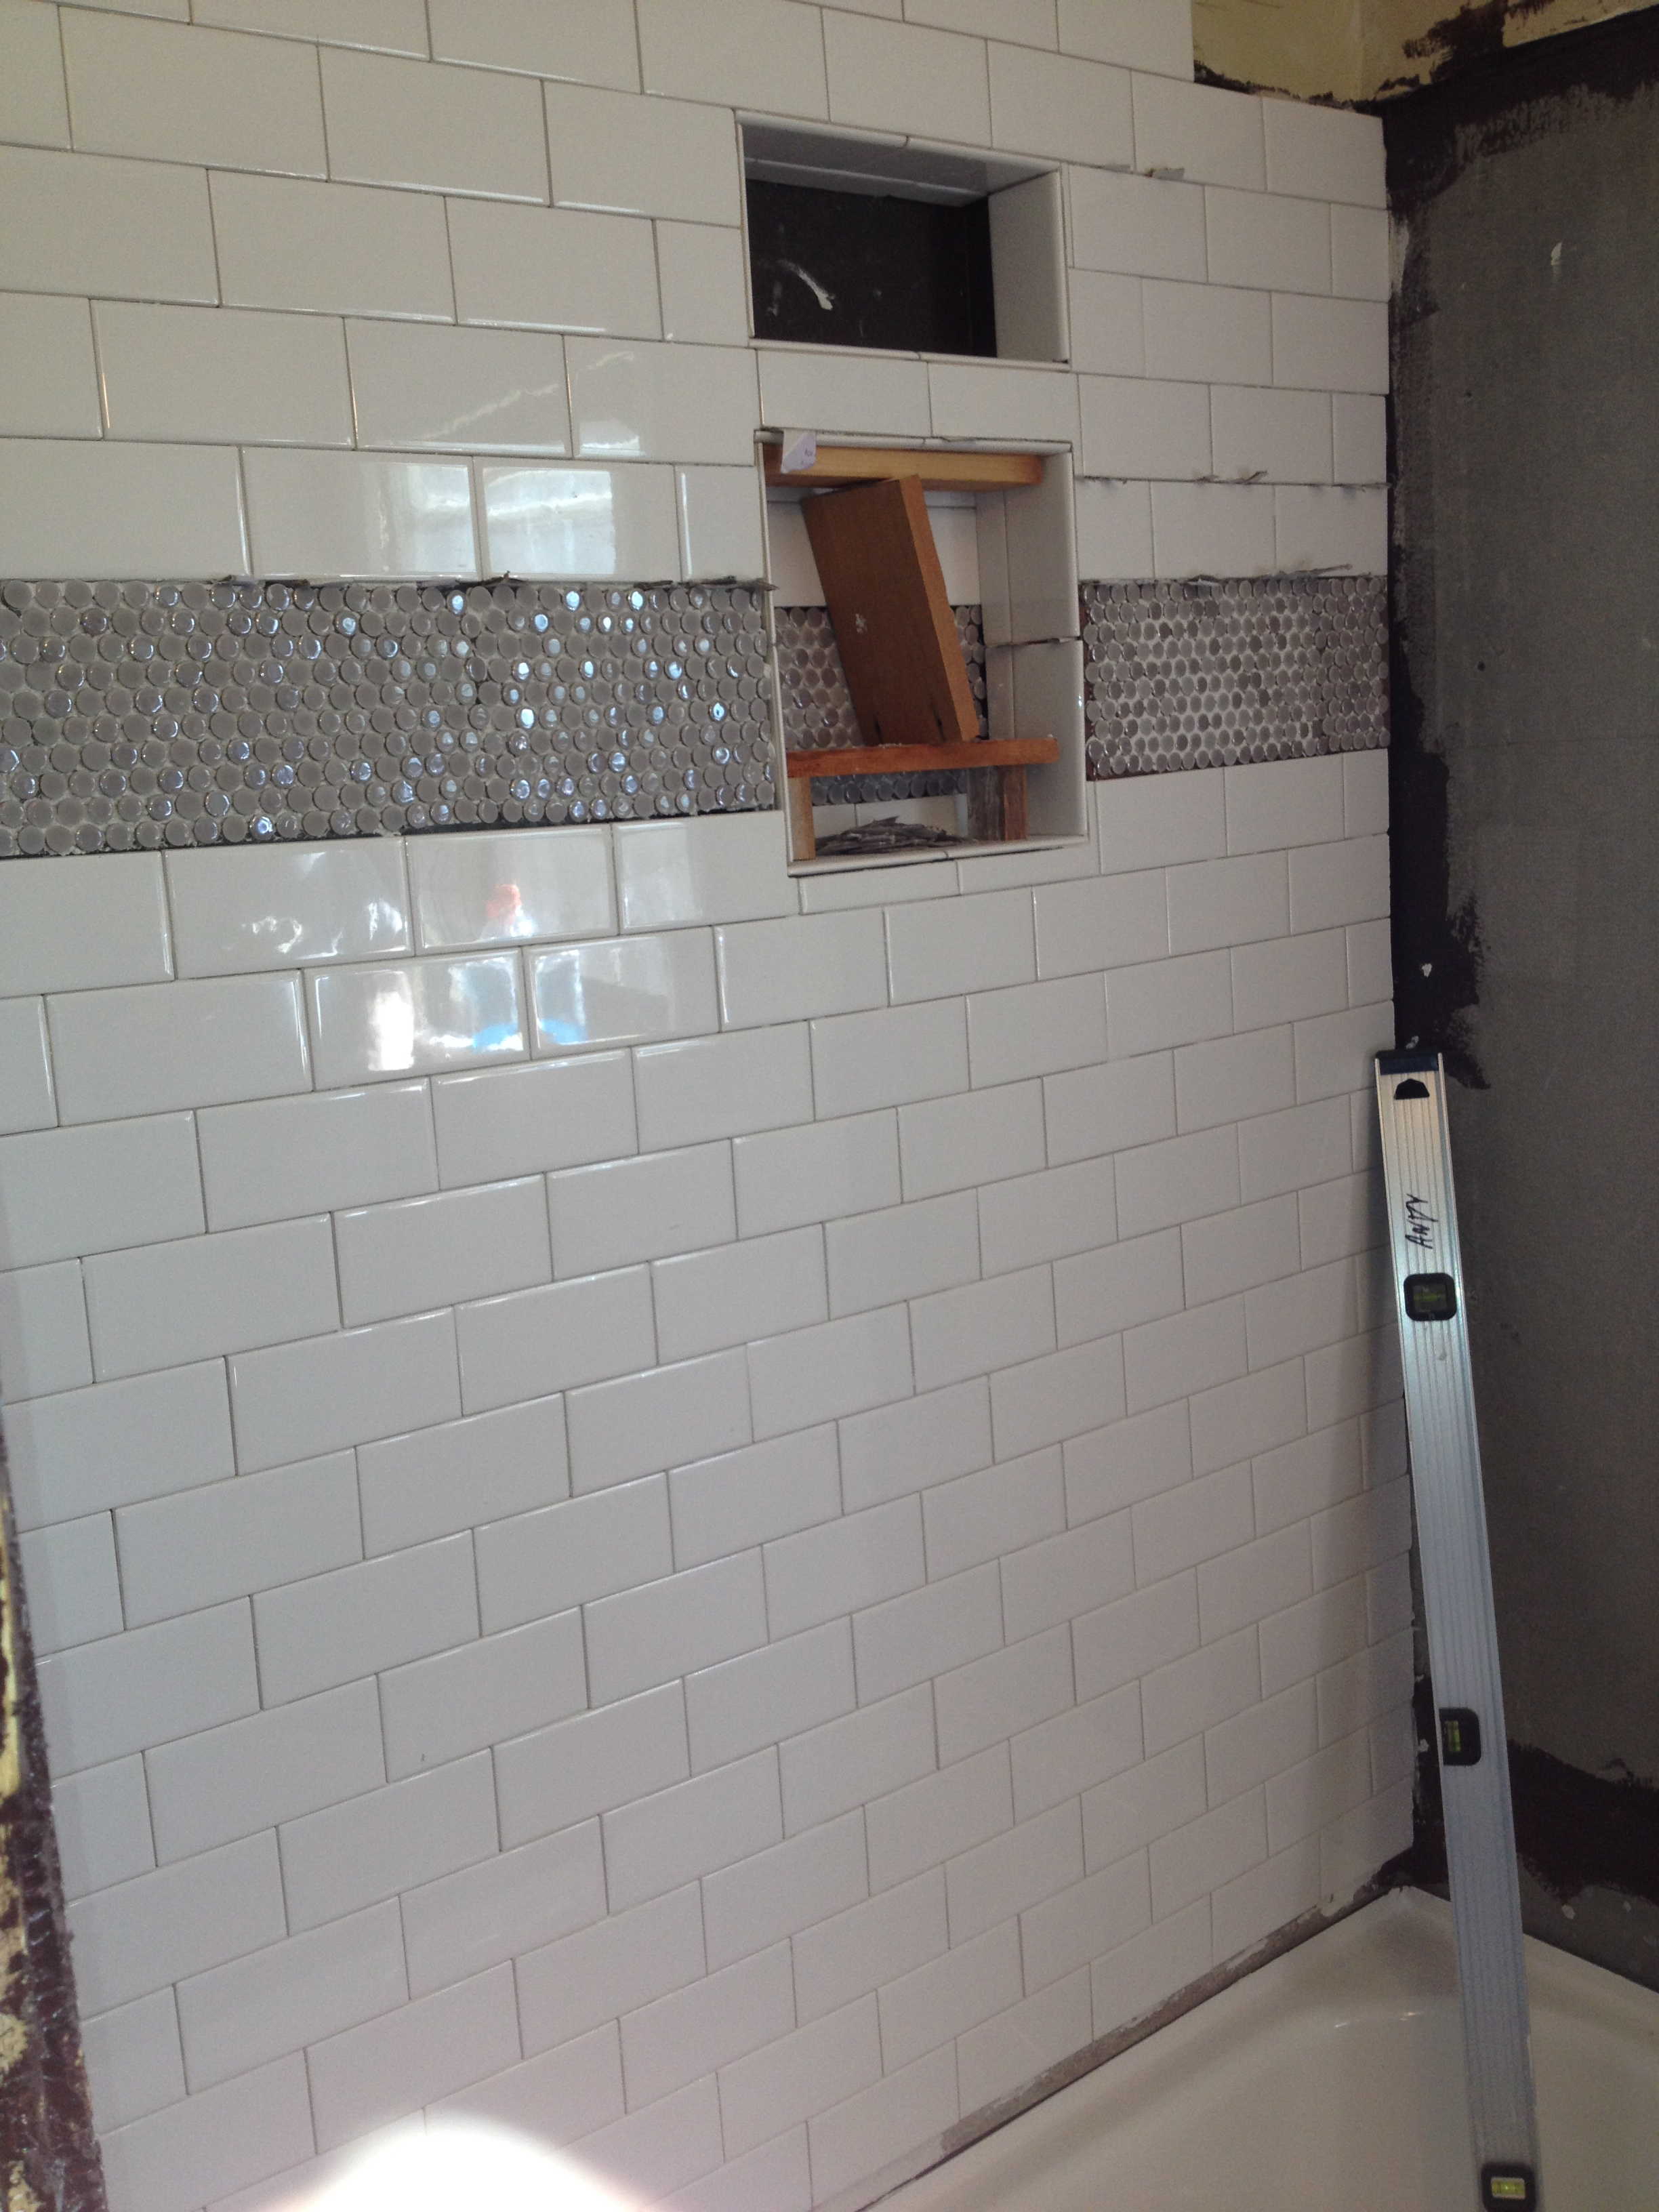 upstairs bathroom tile updates young